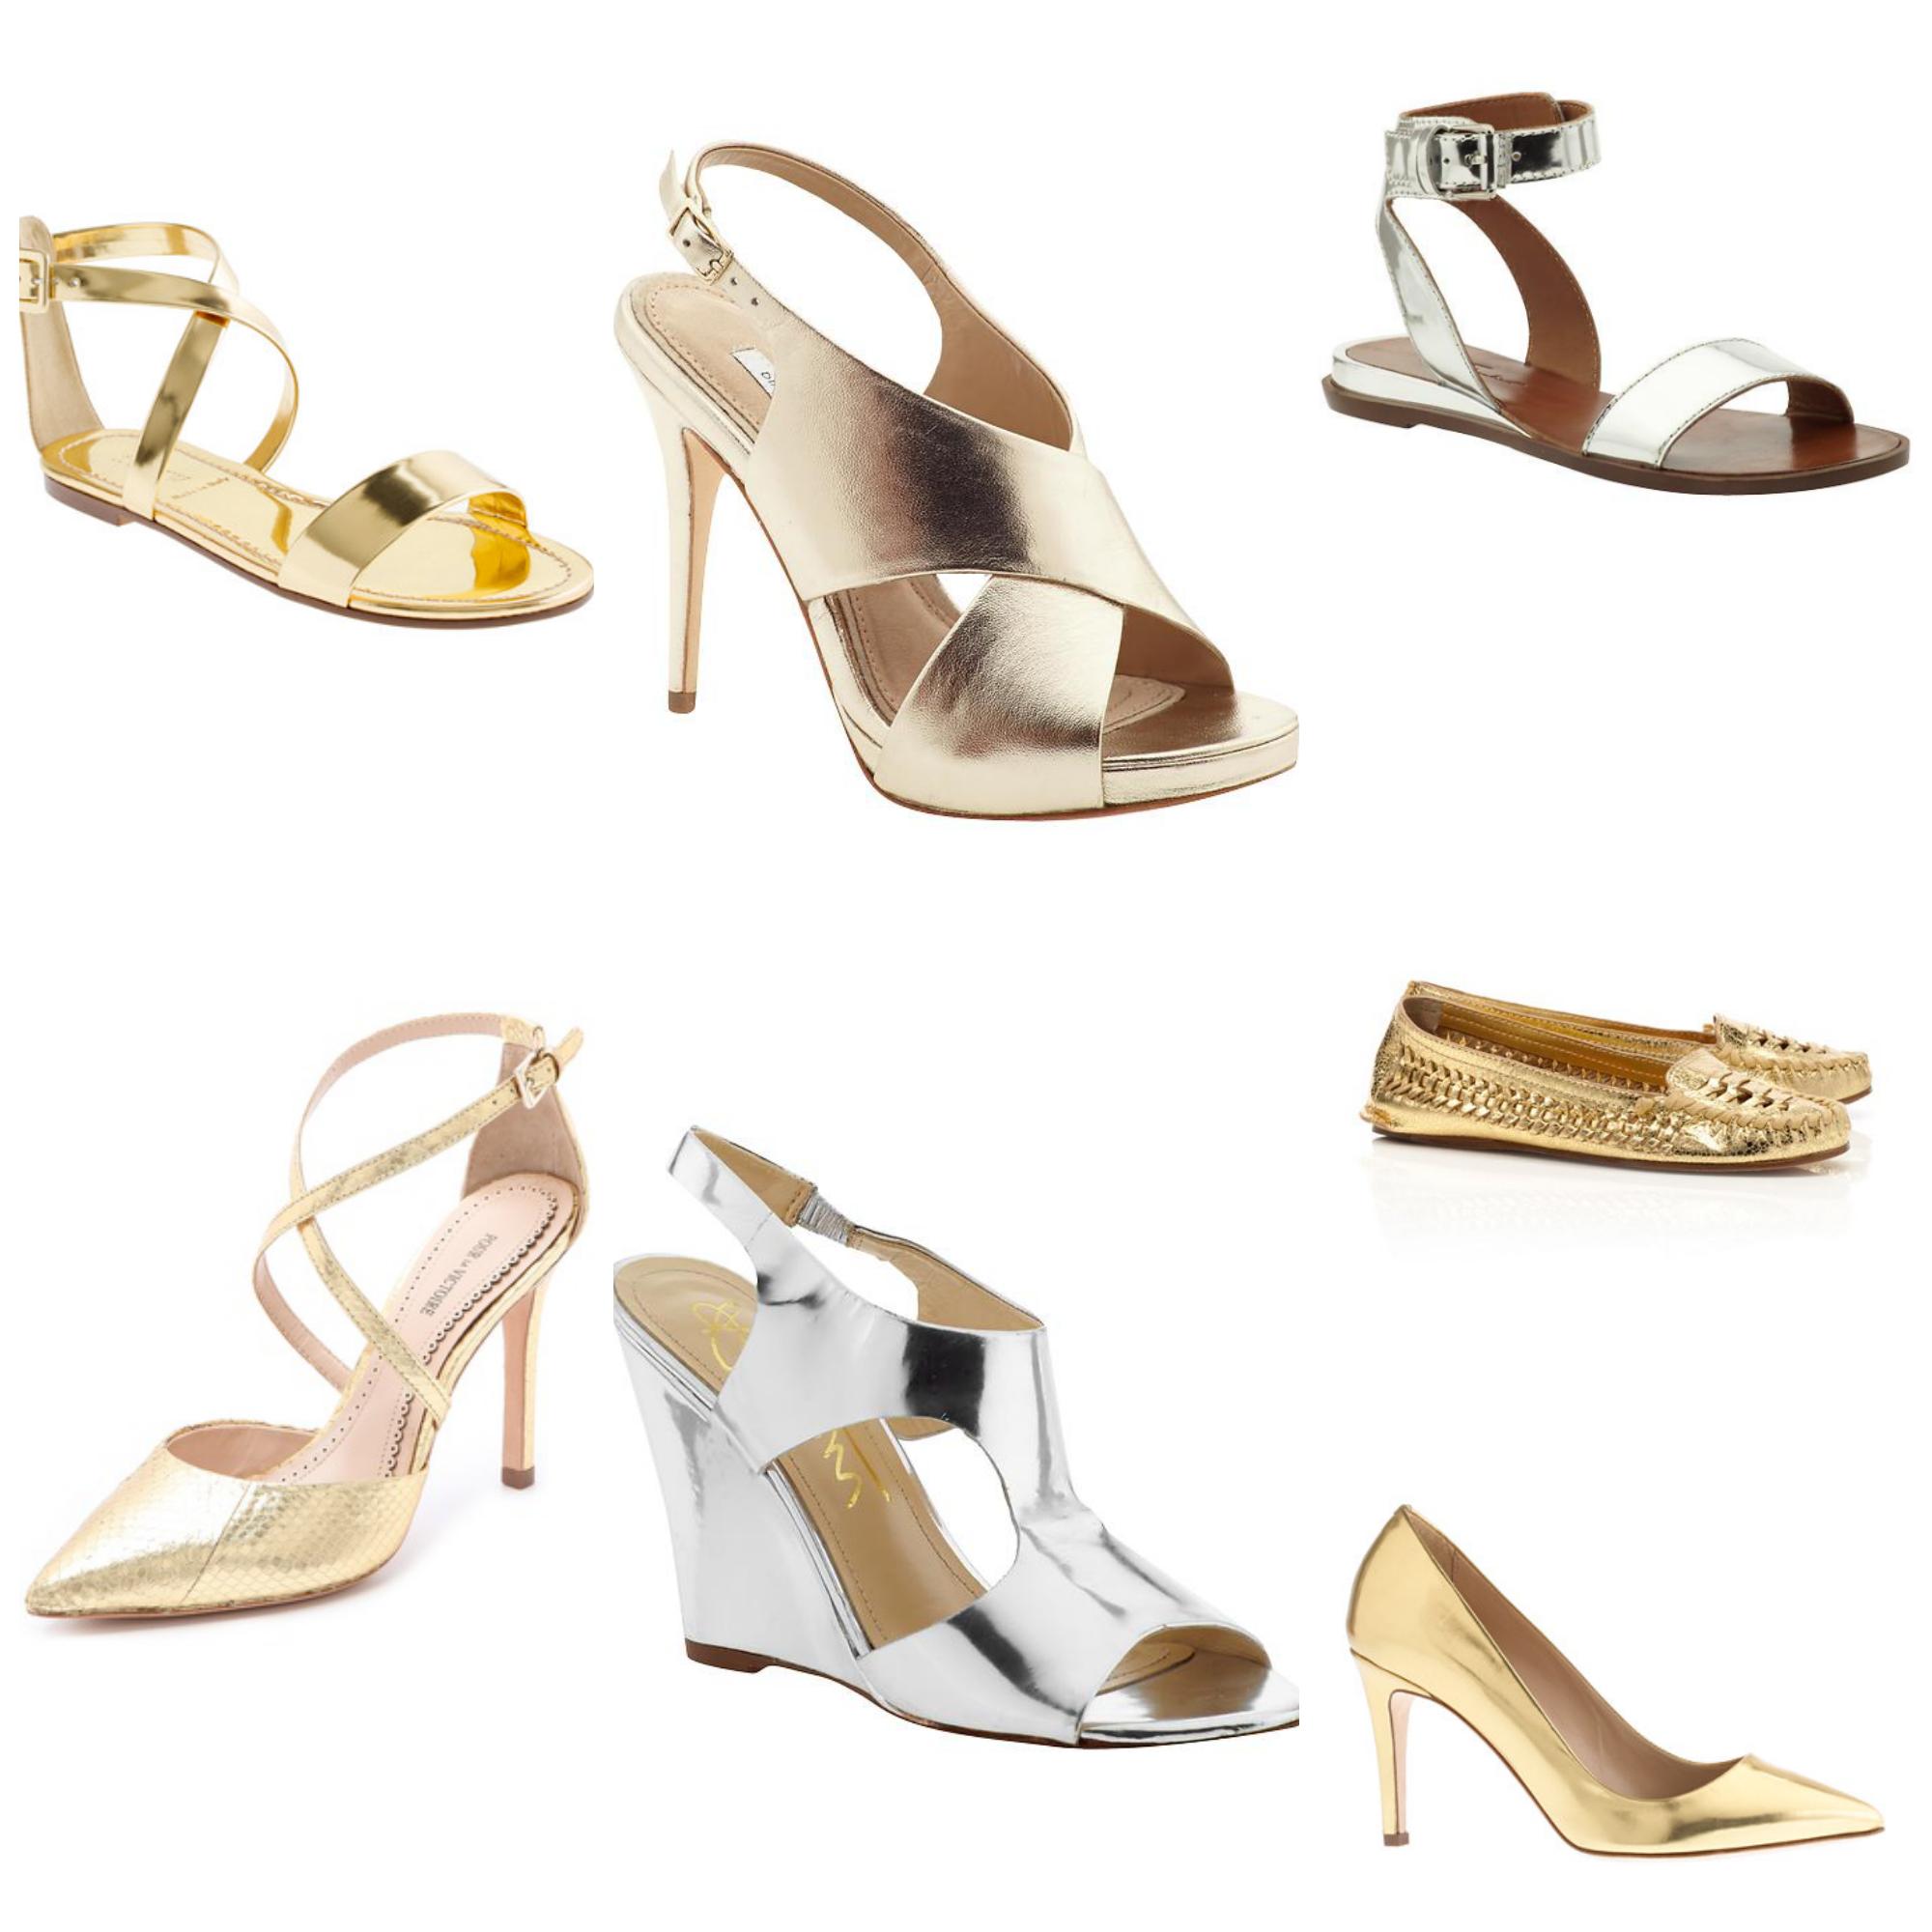 Mirrored Metallic Sandals Wedges